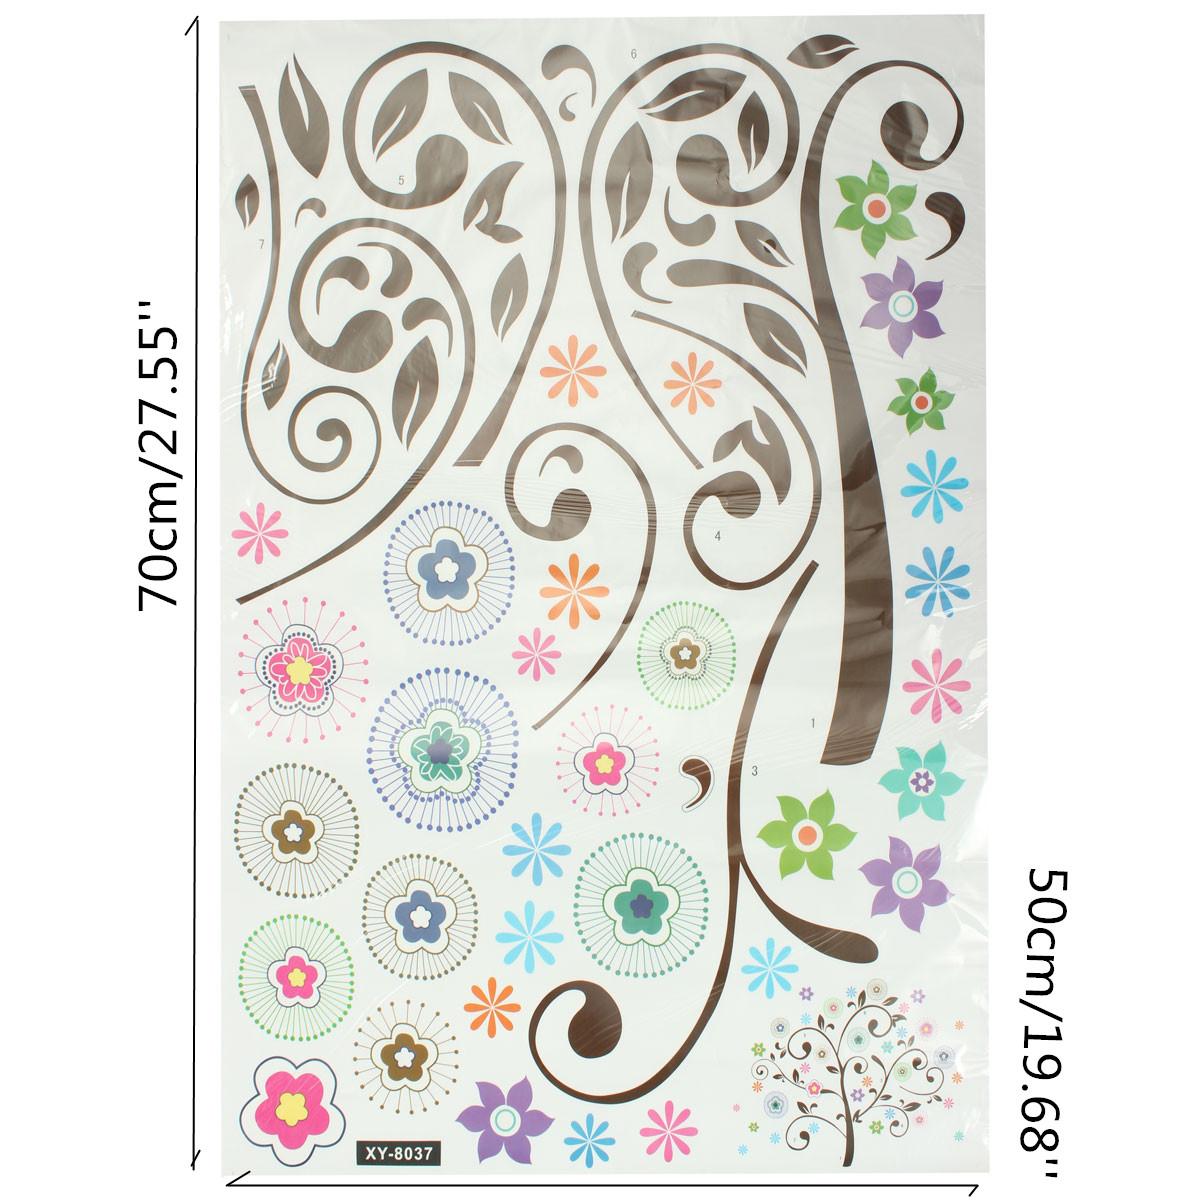 sticker mural fleur lettre amovible d coration autocollant mur chambre salon ebay. Black Bedroom Furniture Sets. Home Design Ideas